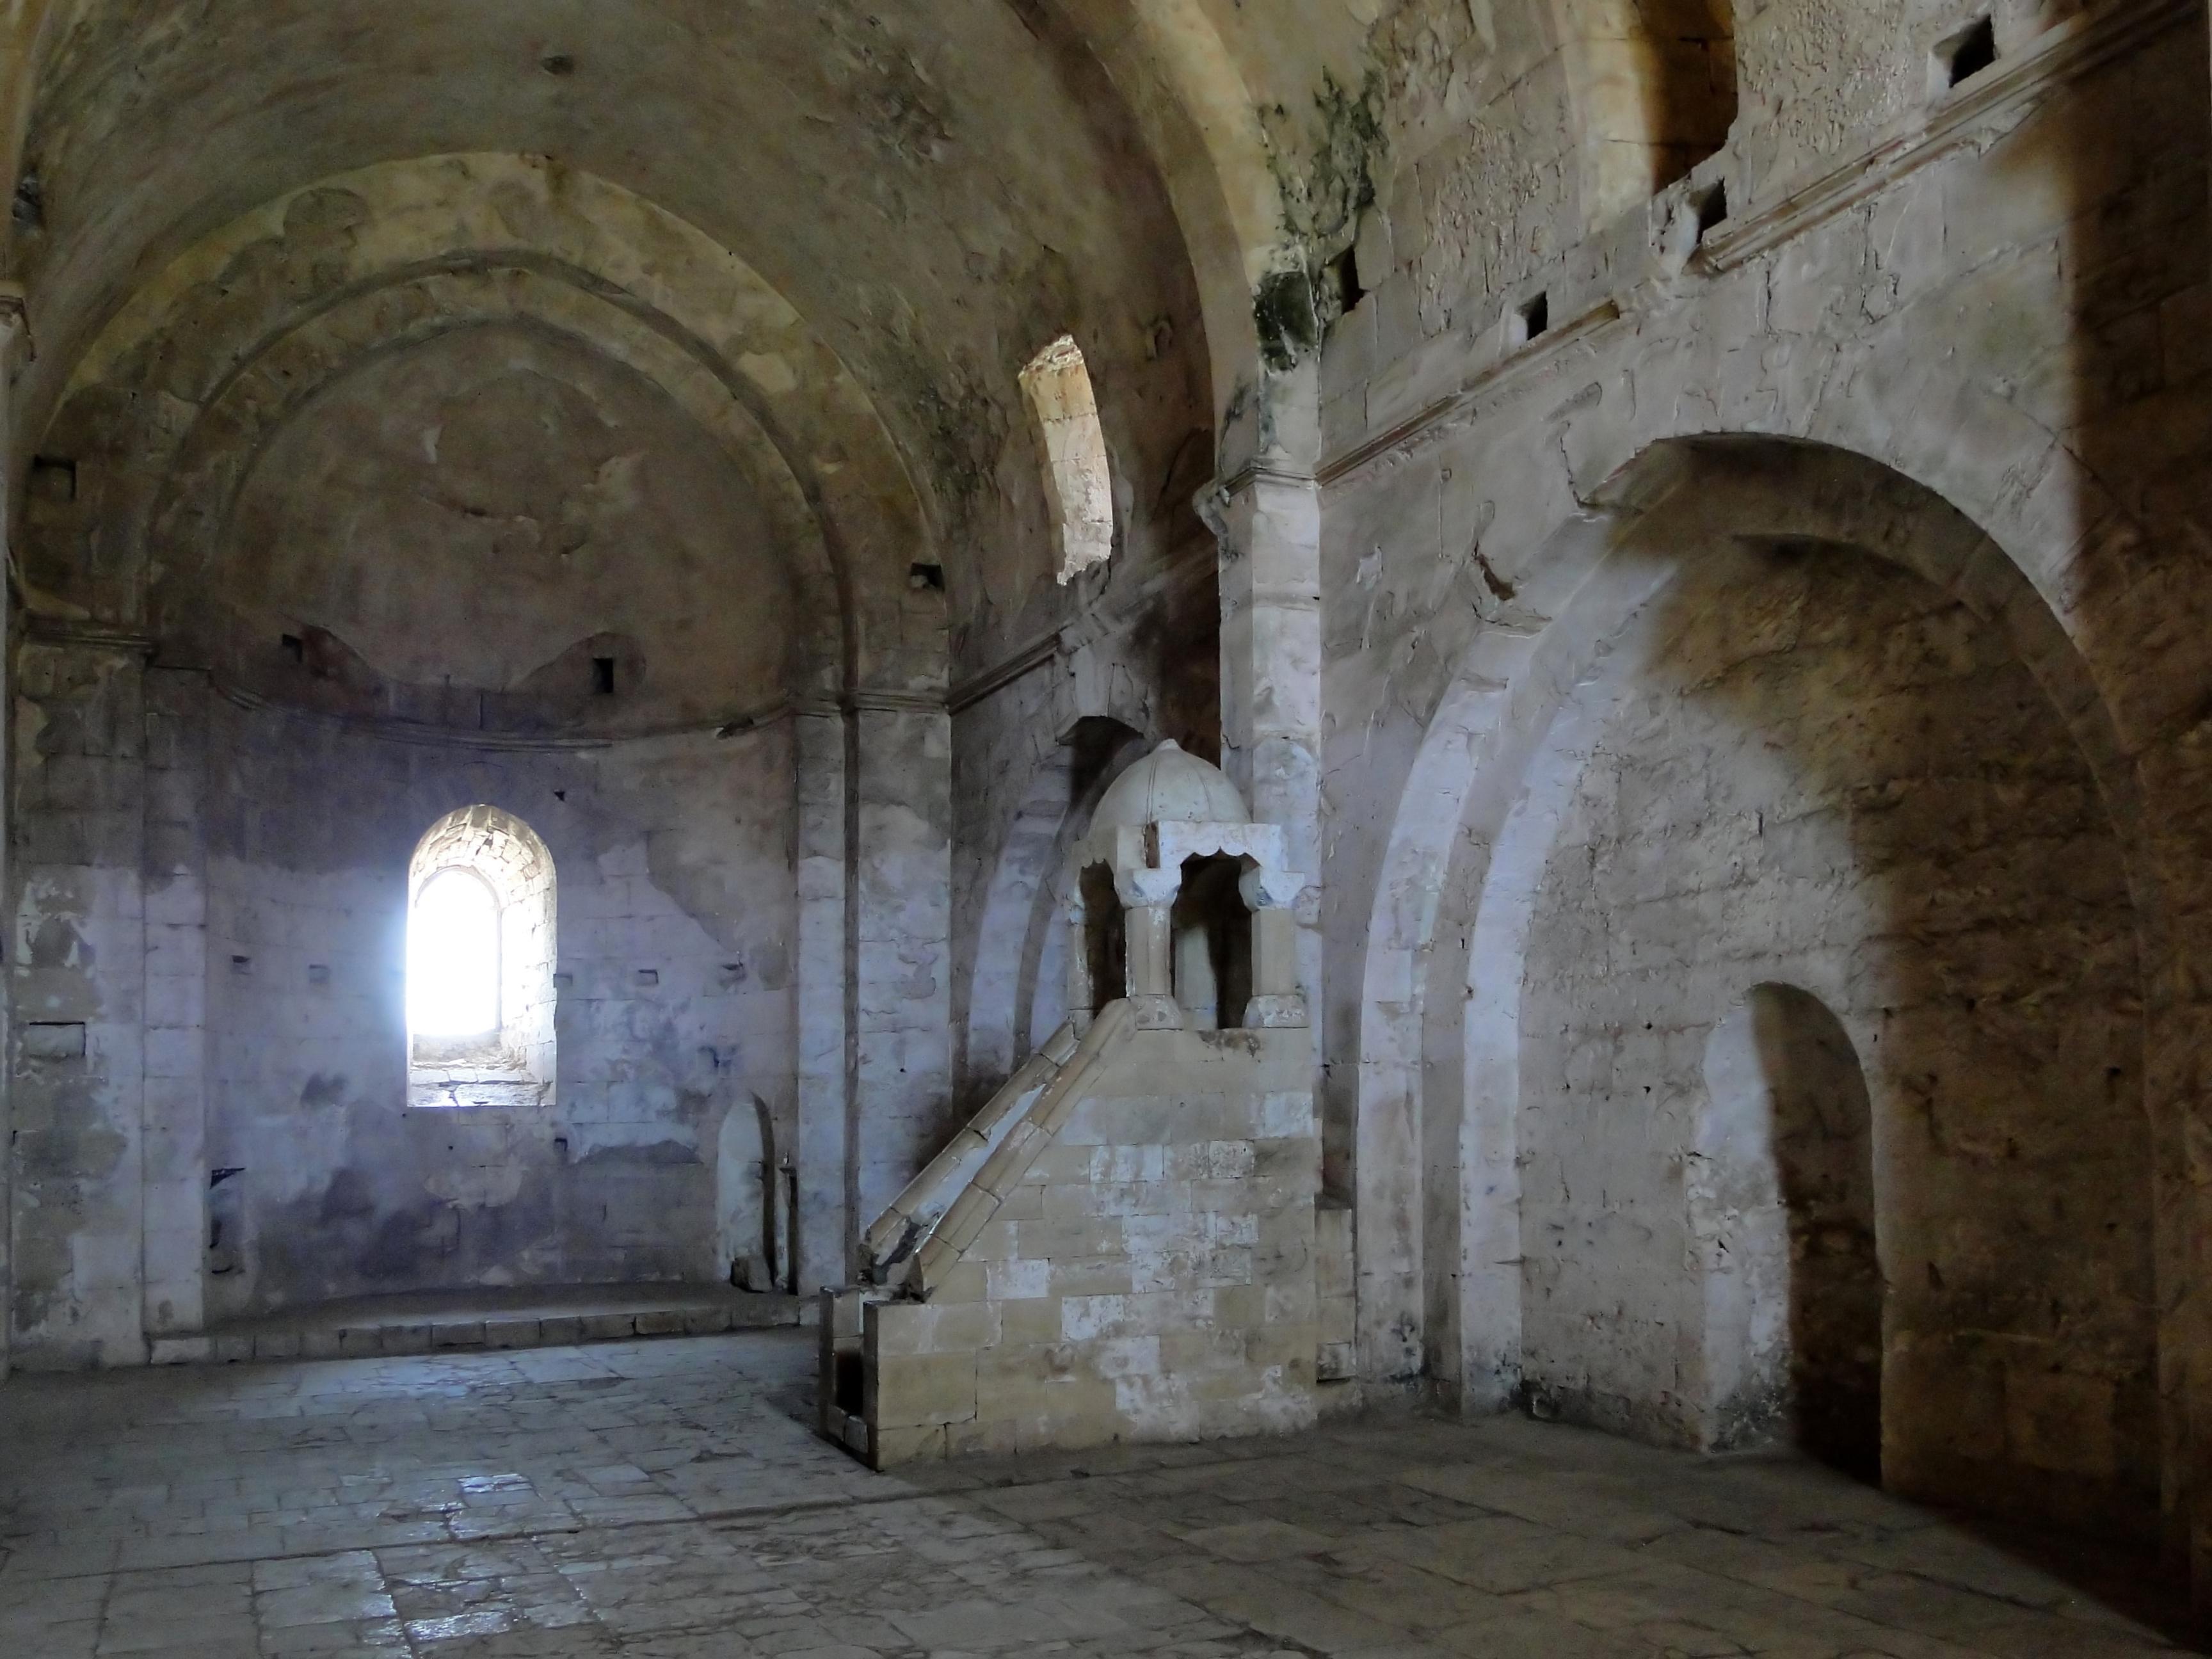 File:Chapel of Krak des Chevaliers 01.jpg - Wikimedia Commons